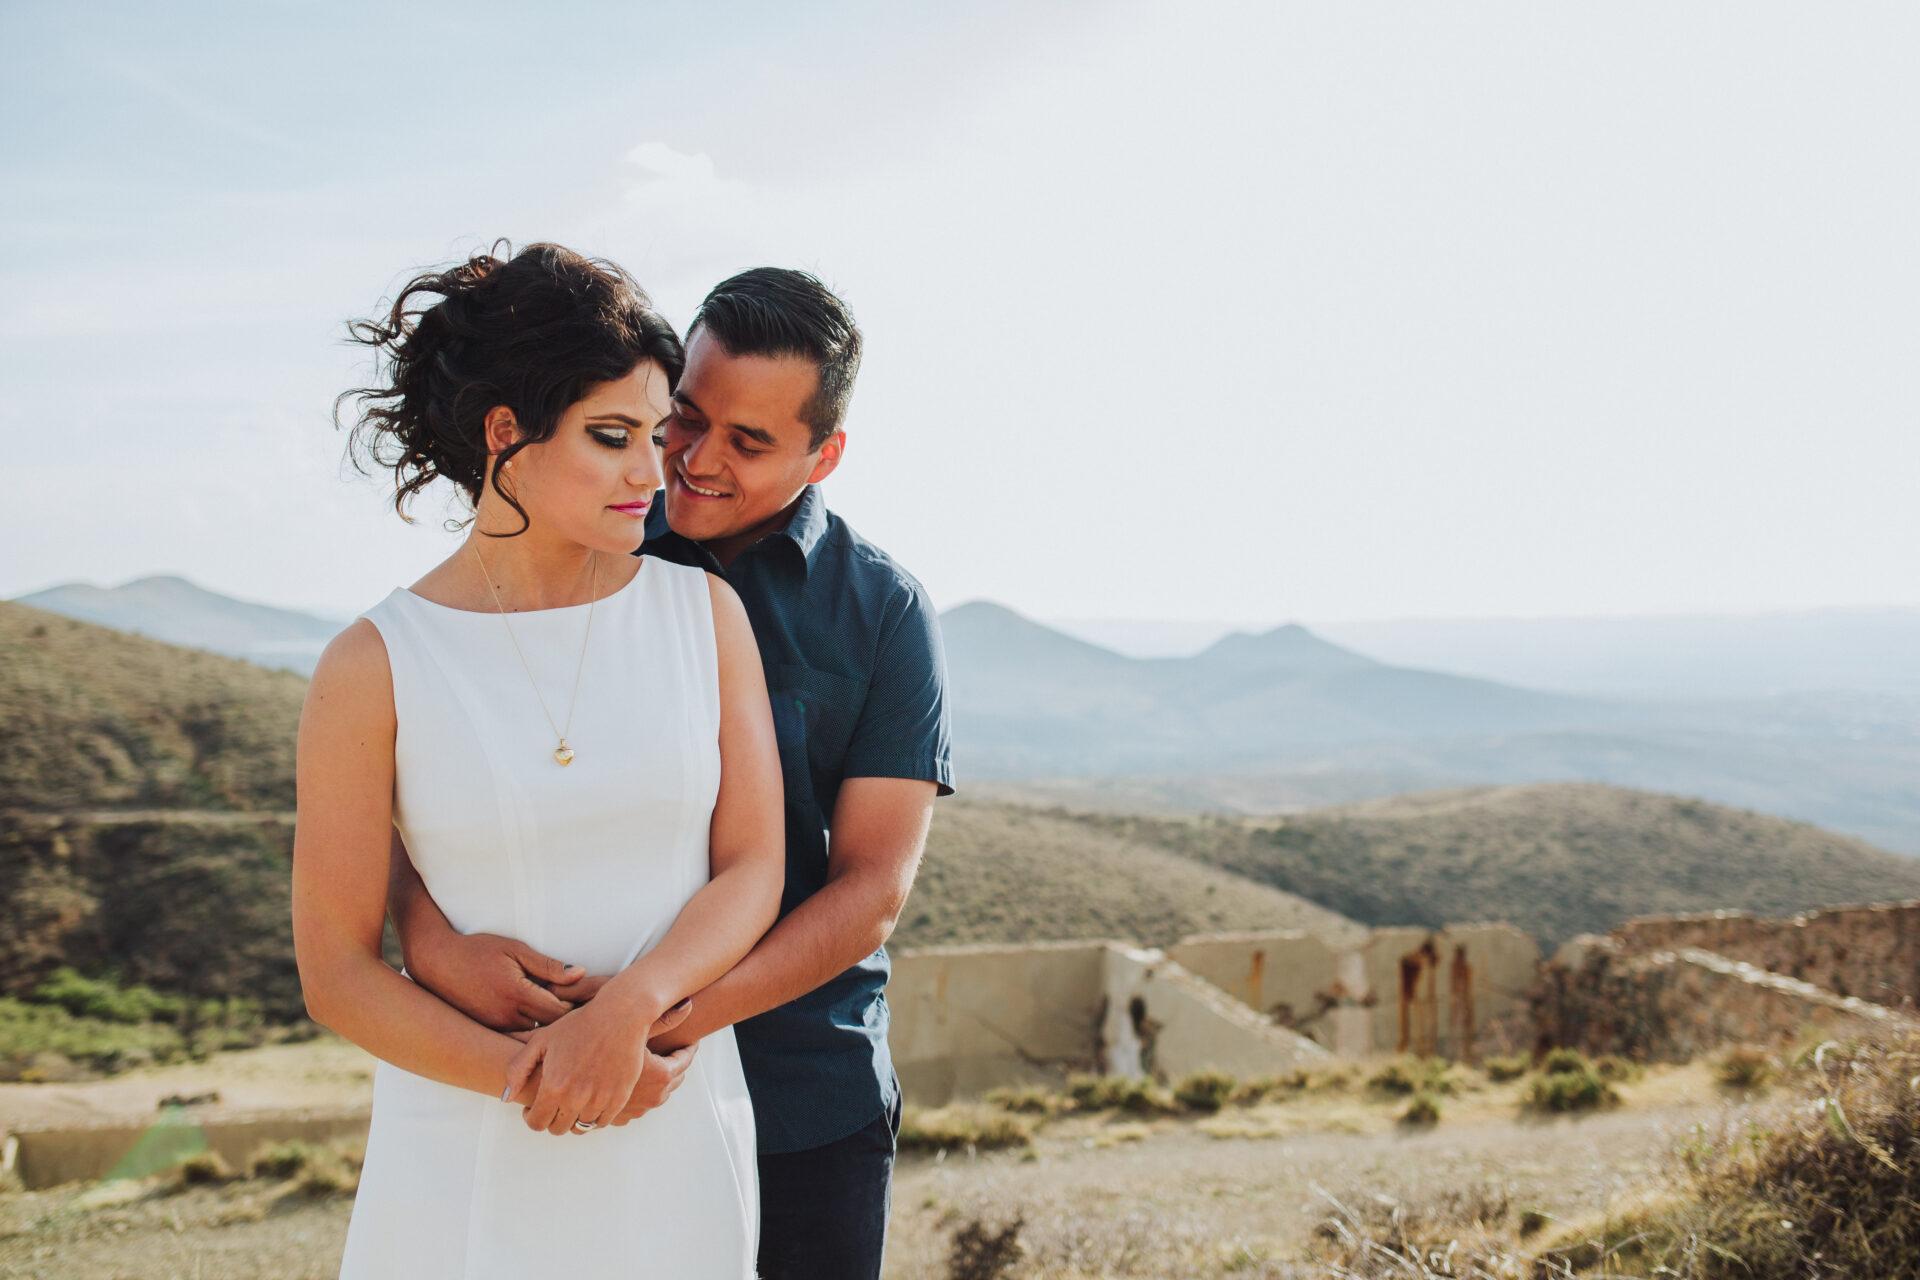 javier_noriega_fotografo_save_the_date_zacatecas_wedding_photographer3